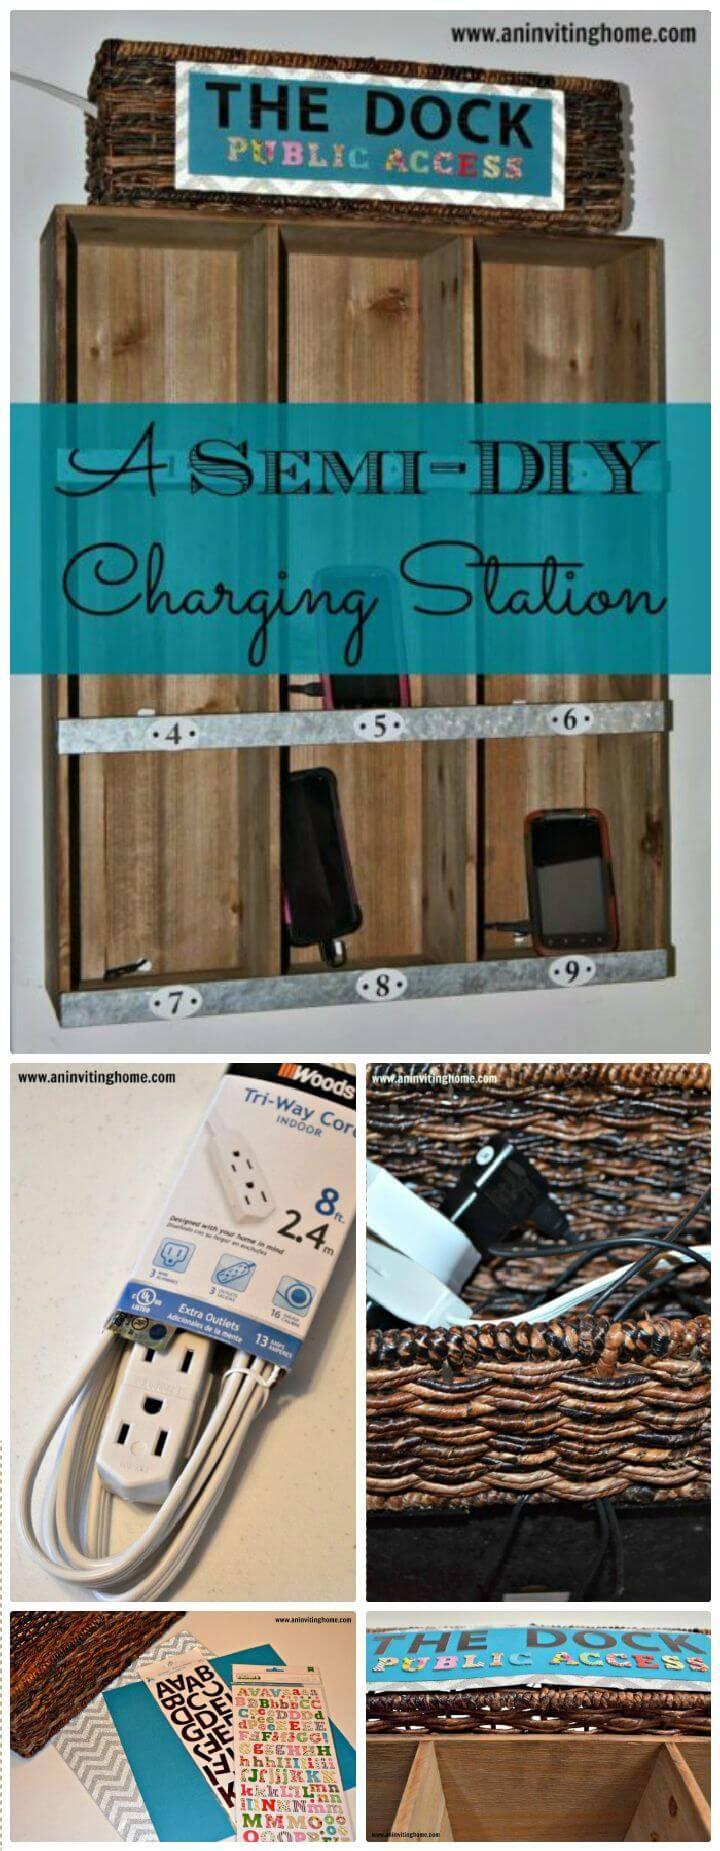 A Semi-DIY Charging Station